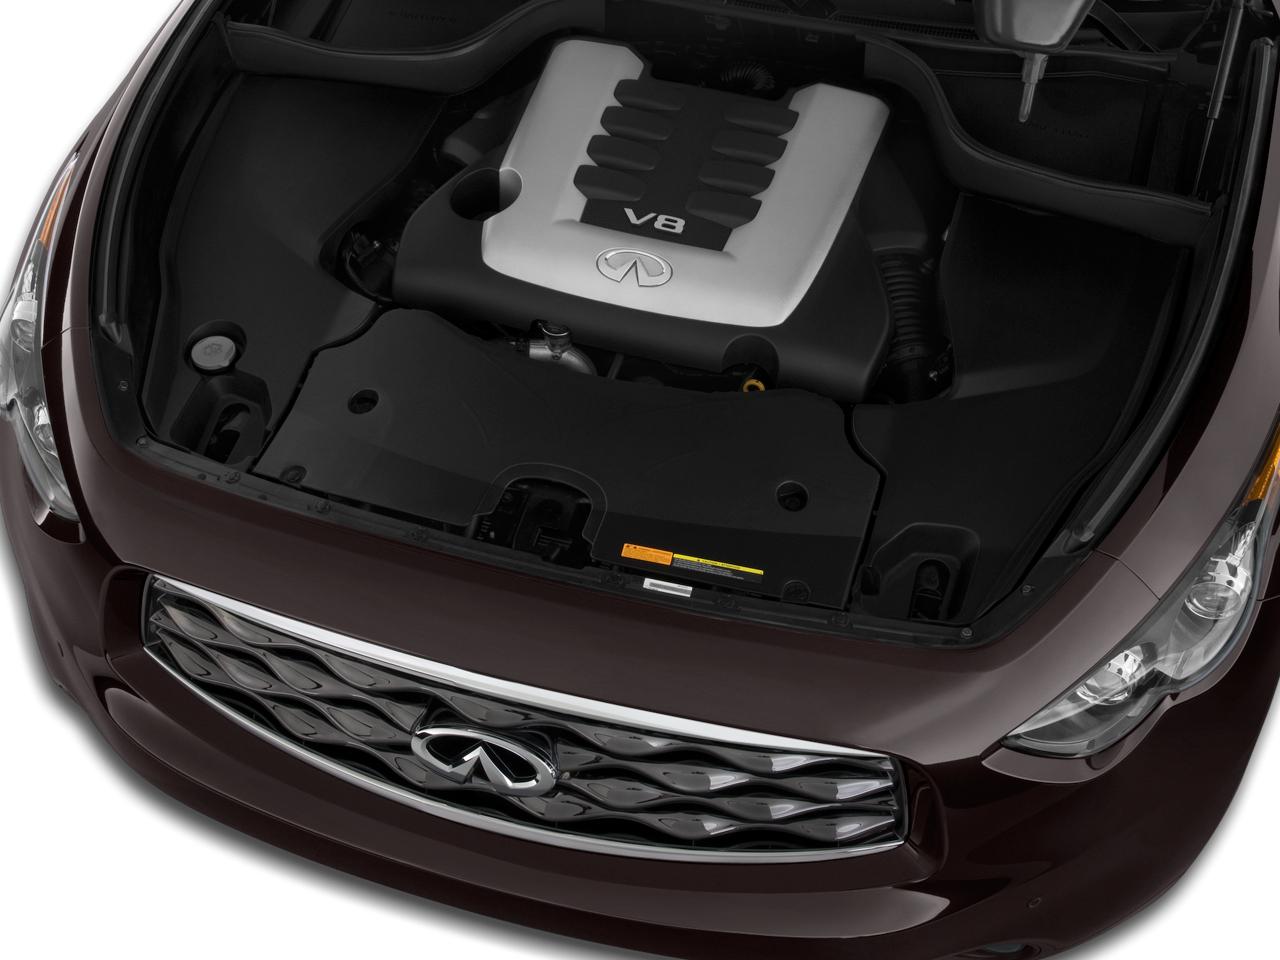 2009 Infiniti FX35 - Latest News, Reviews, and Auto Show ...